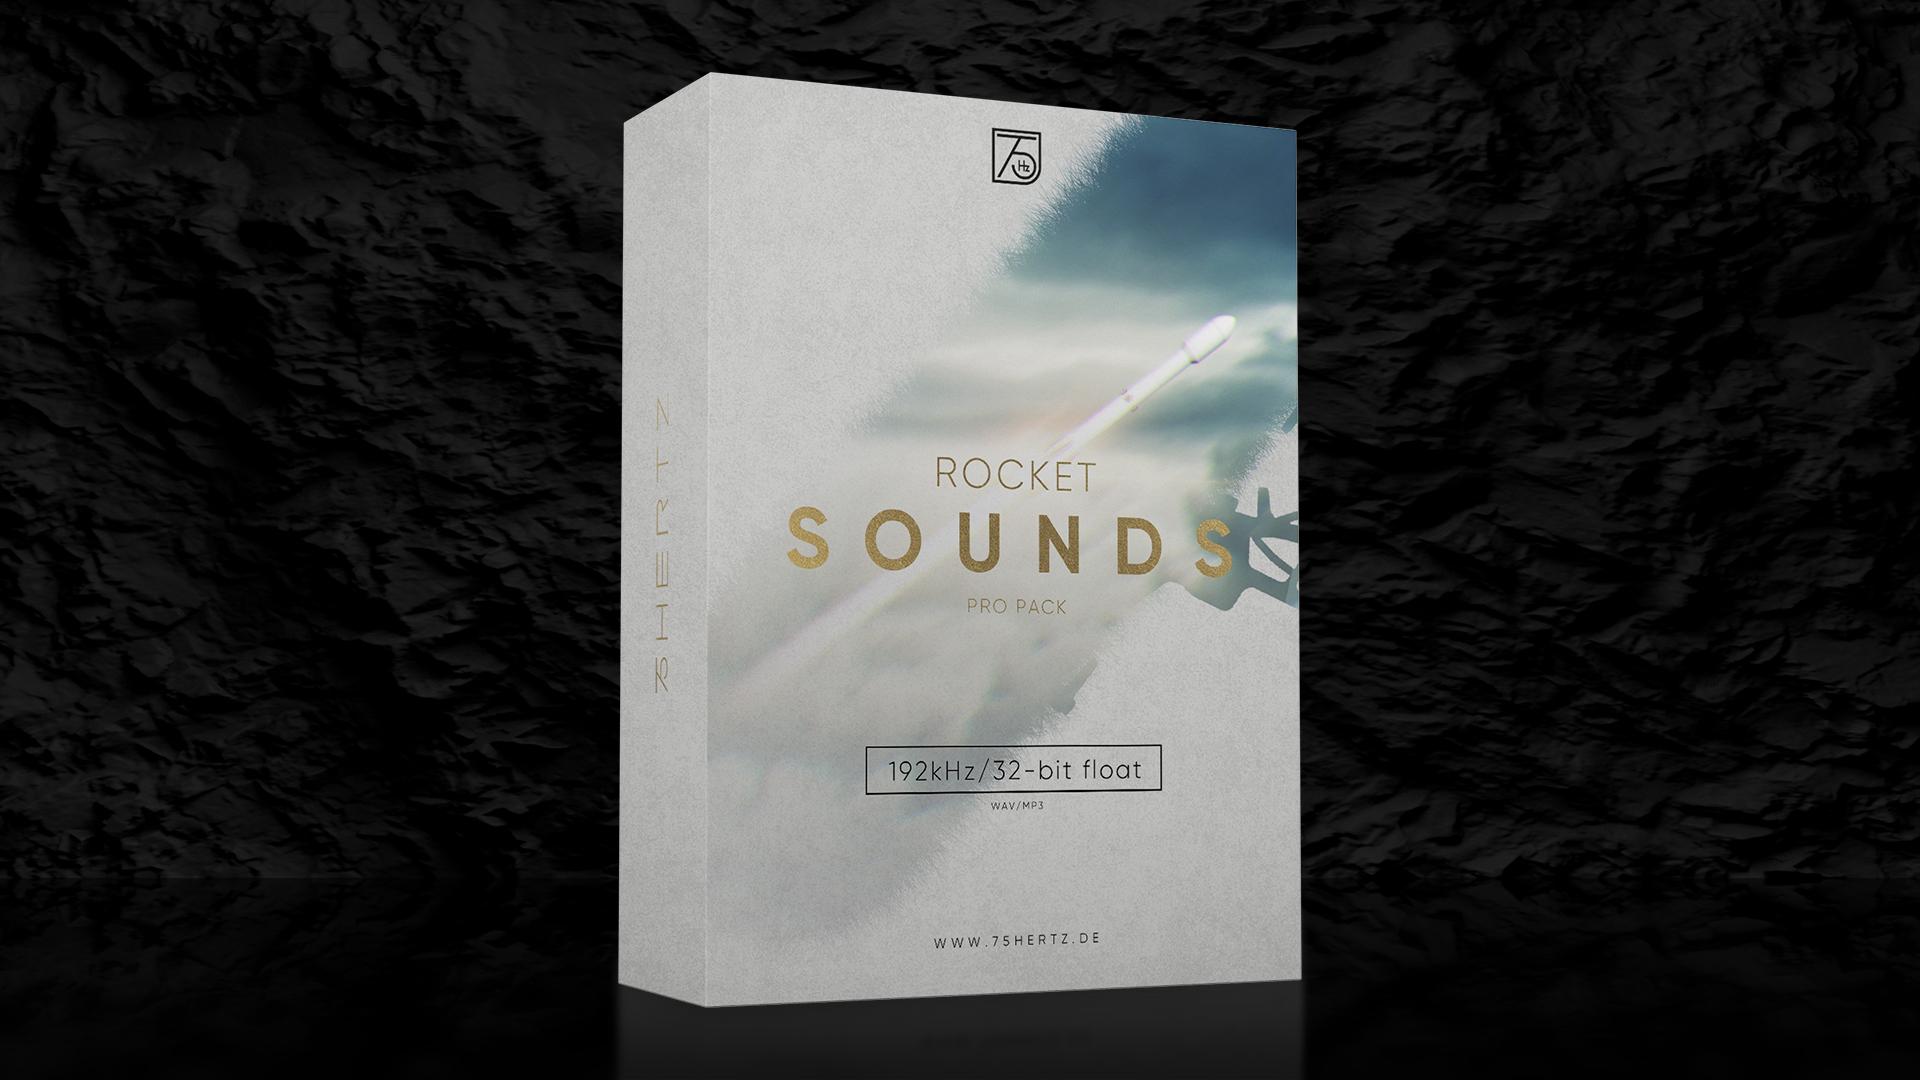 Rocket Sound – Pro Pack